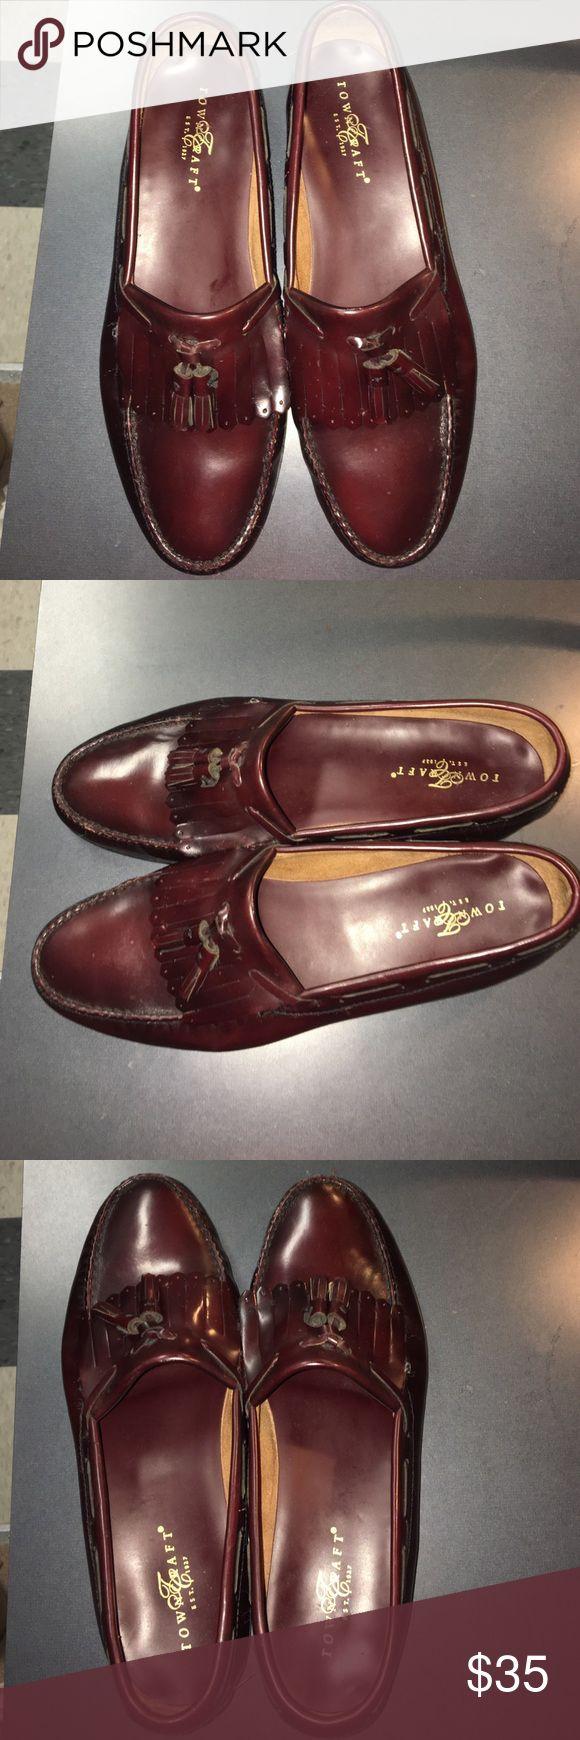 Town craft Town craft men shoes Shoes Oxfords & Derbys